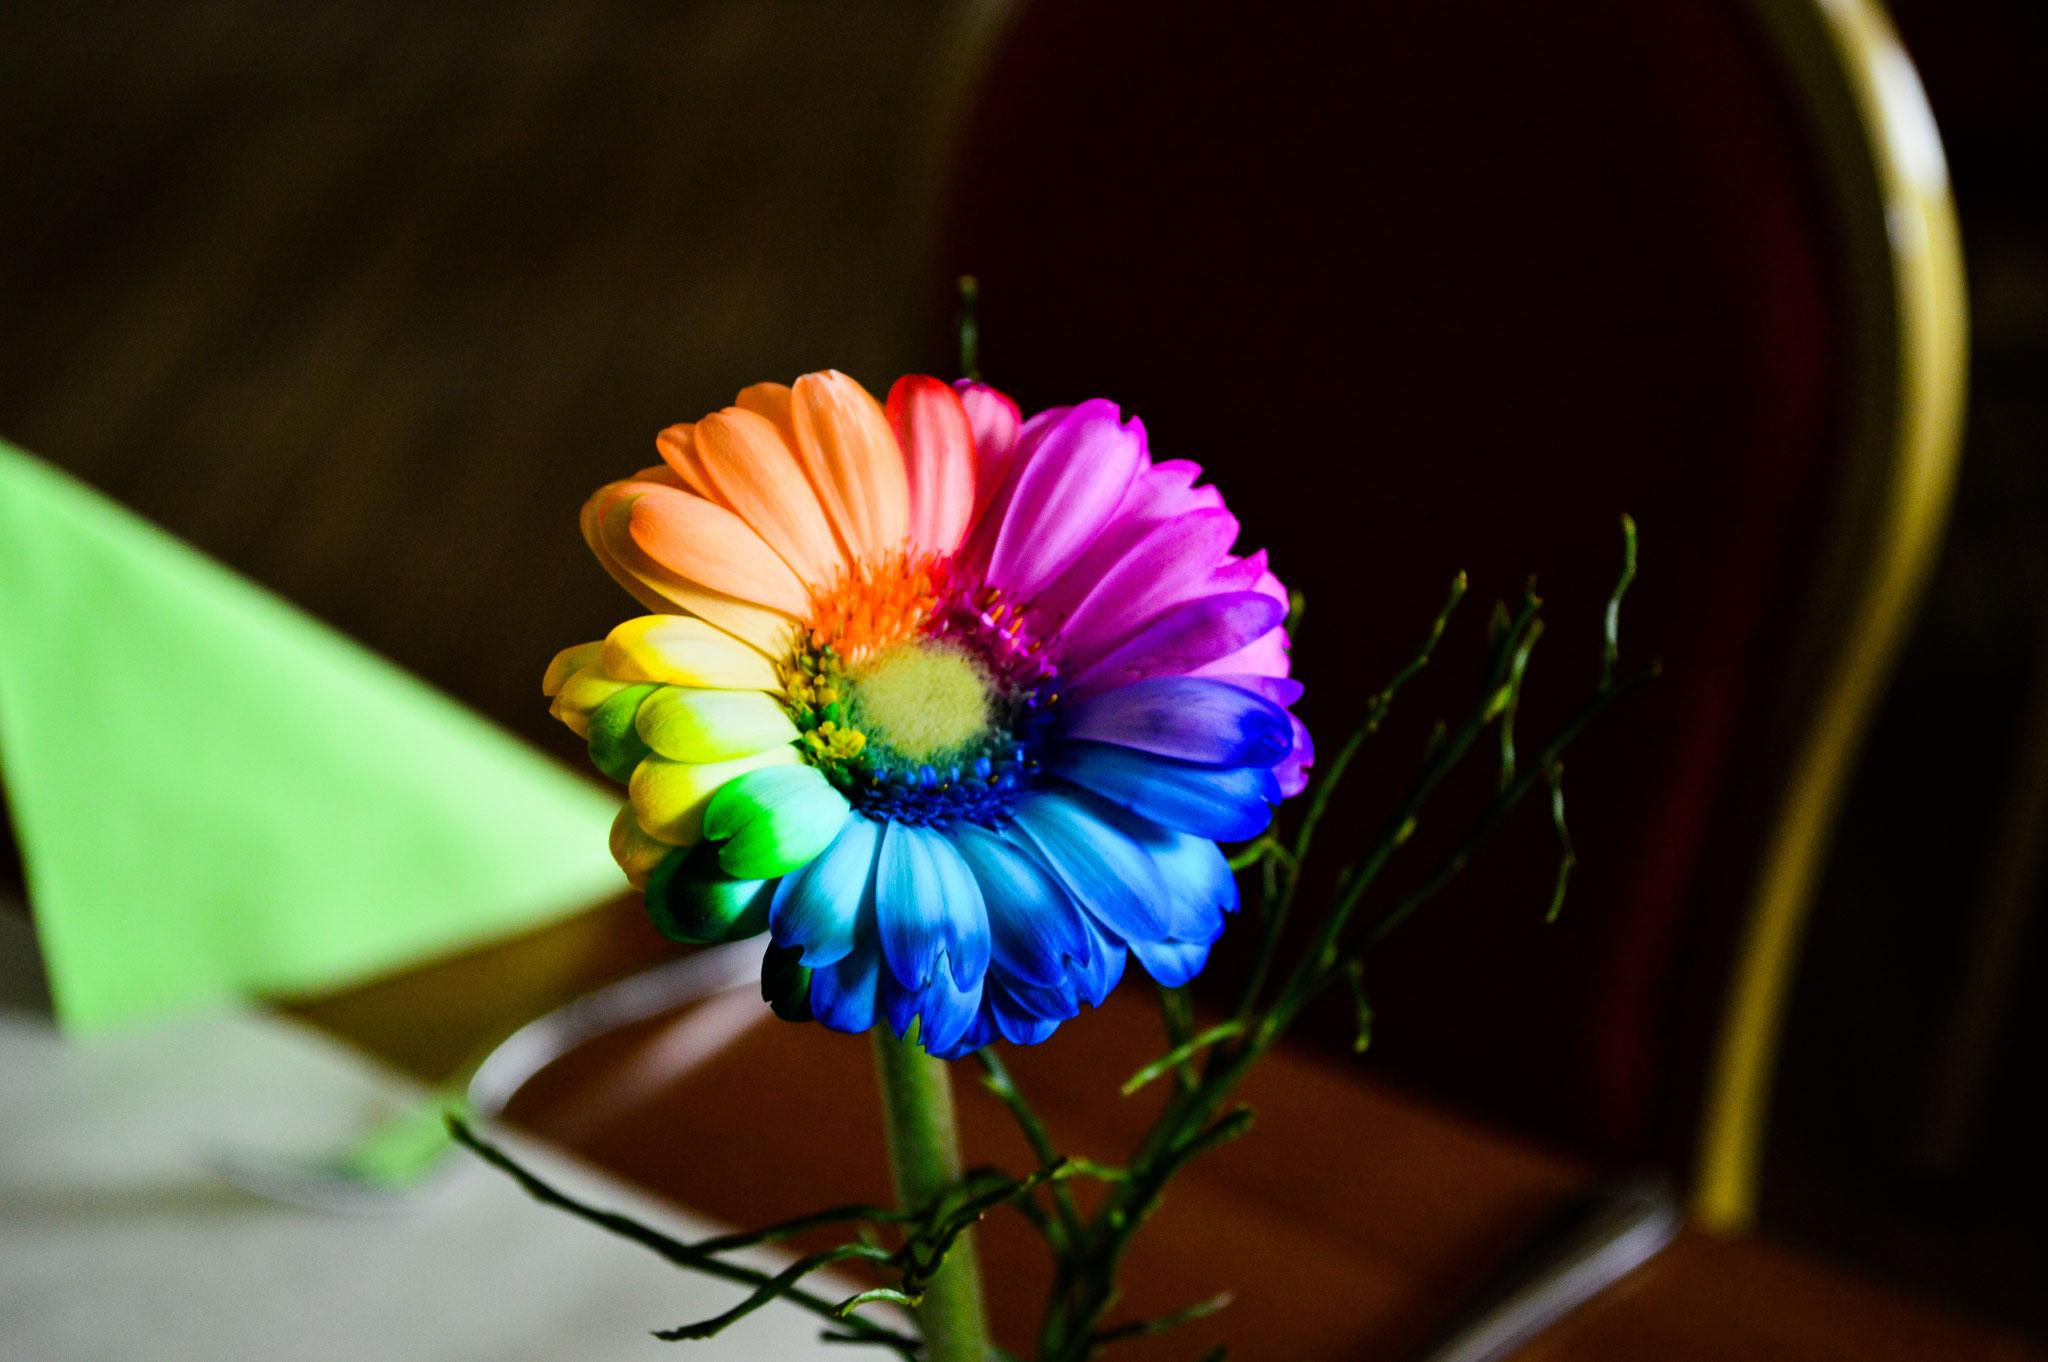 Regenbogen-Gerbera passend zum Regenbogen Song